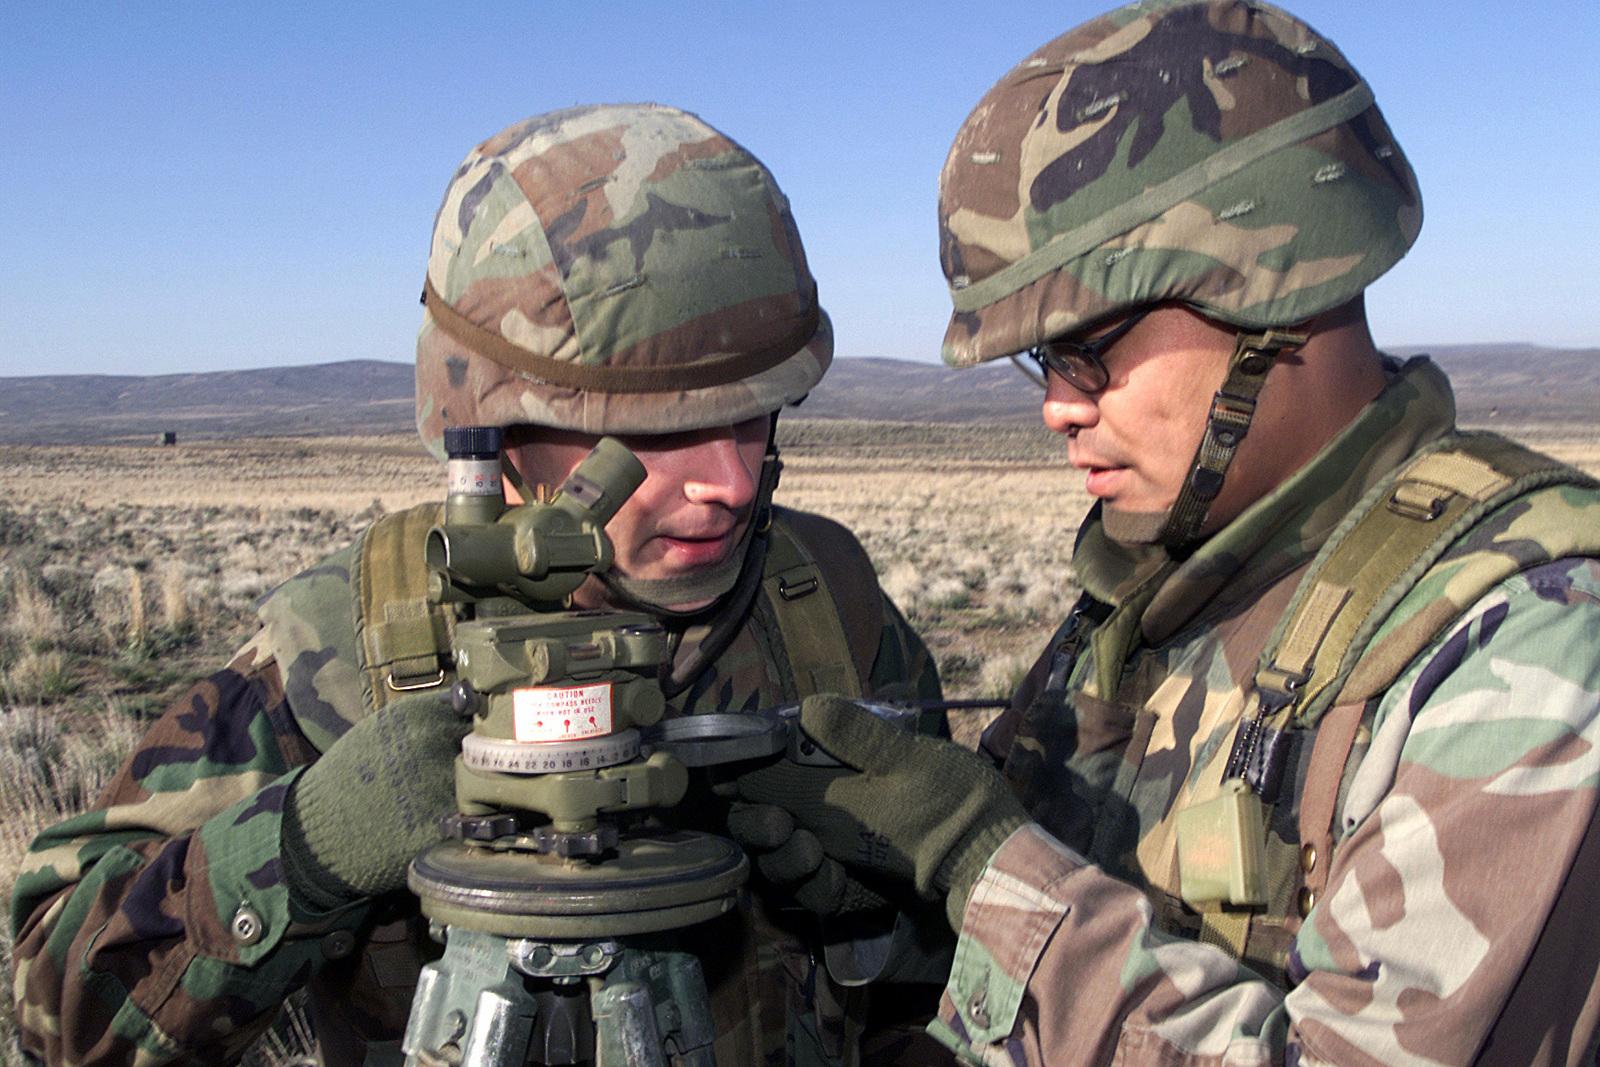 gunnery sergeant ruldofo serino usmc right compass in hand and